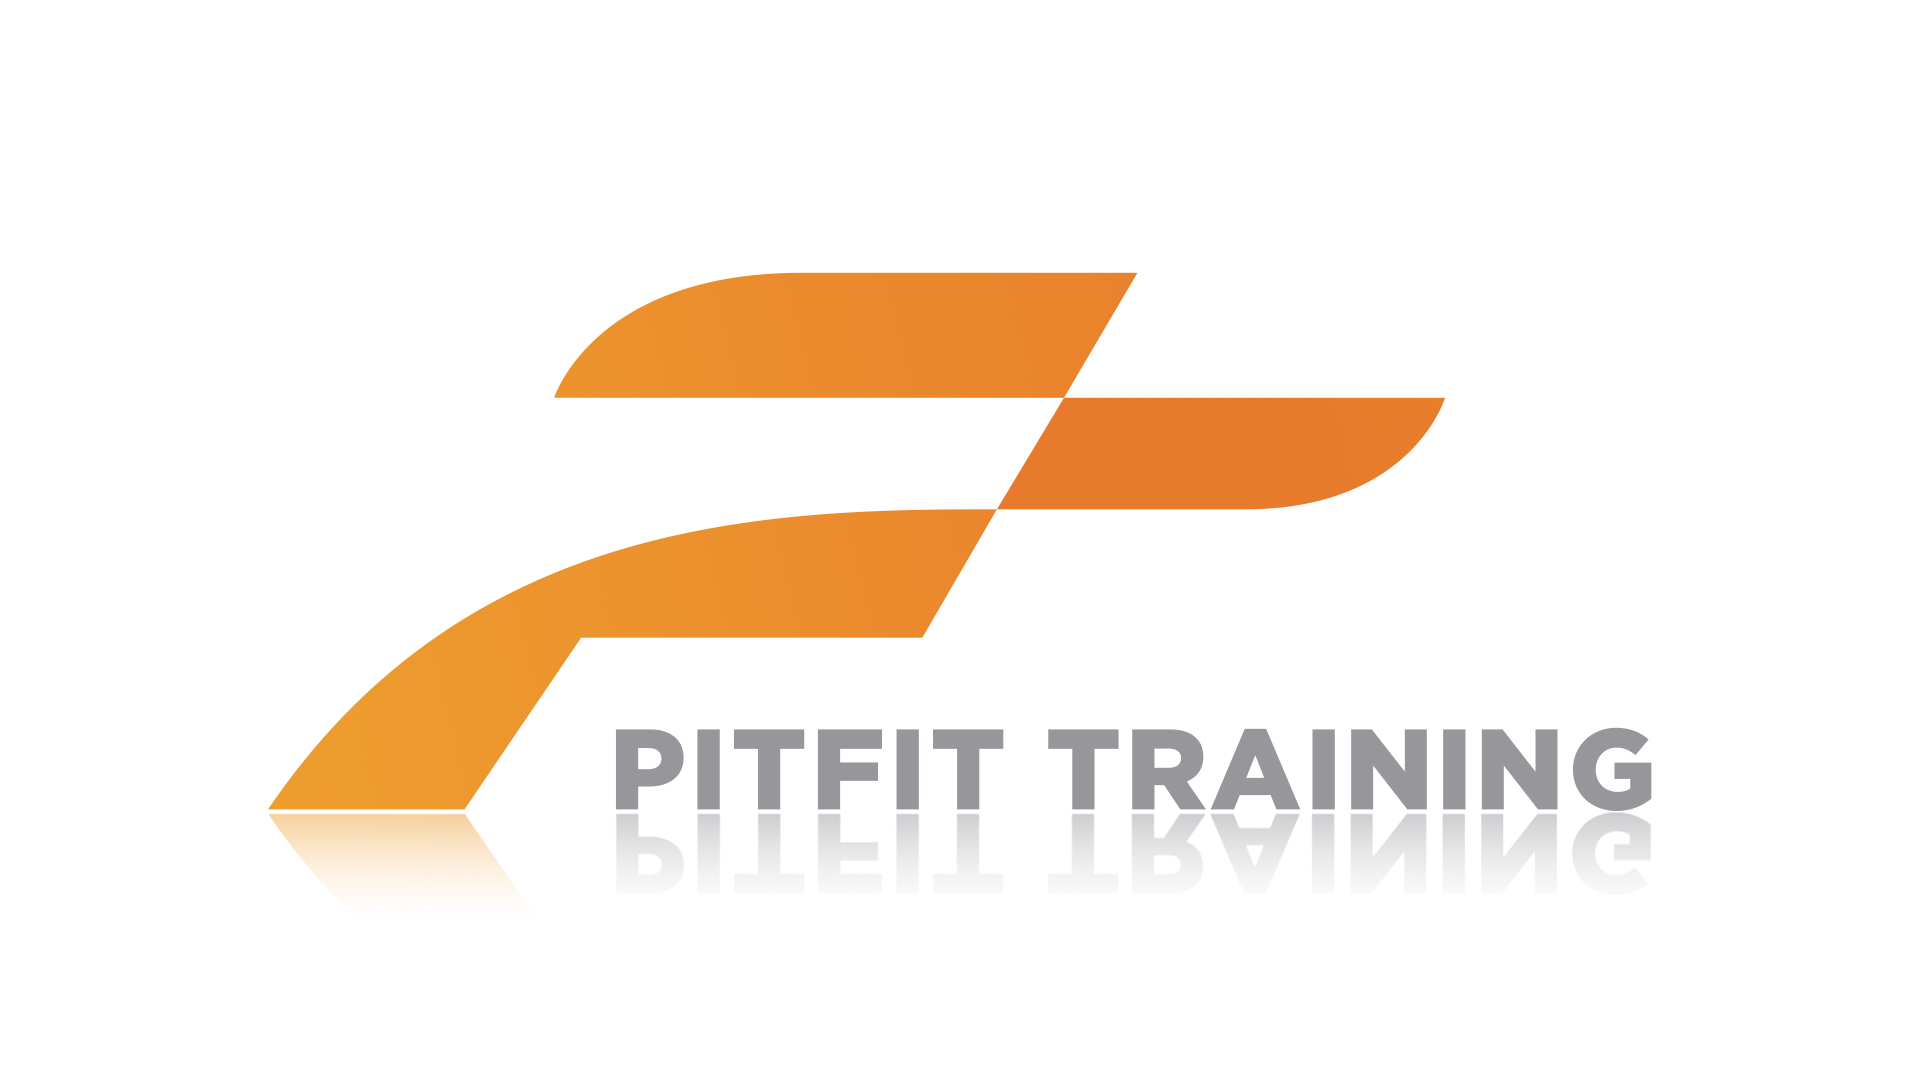 PitFit Training - HylthLink | Connecting Health